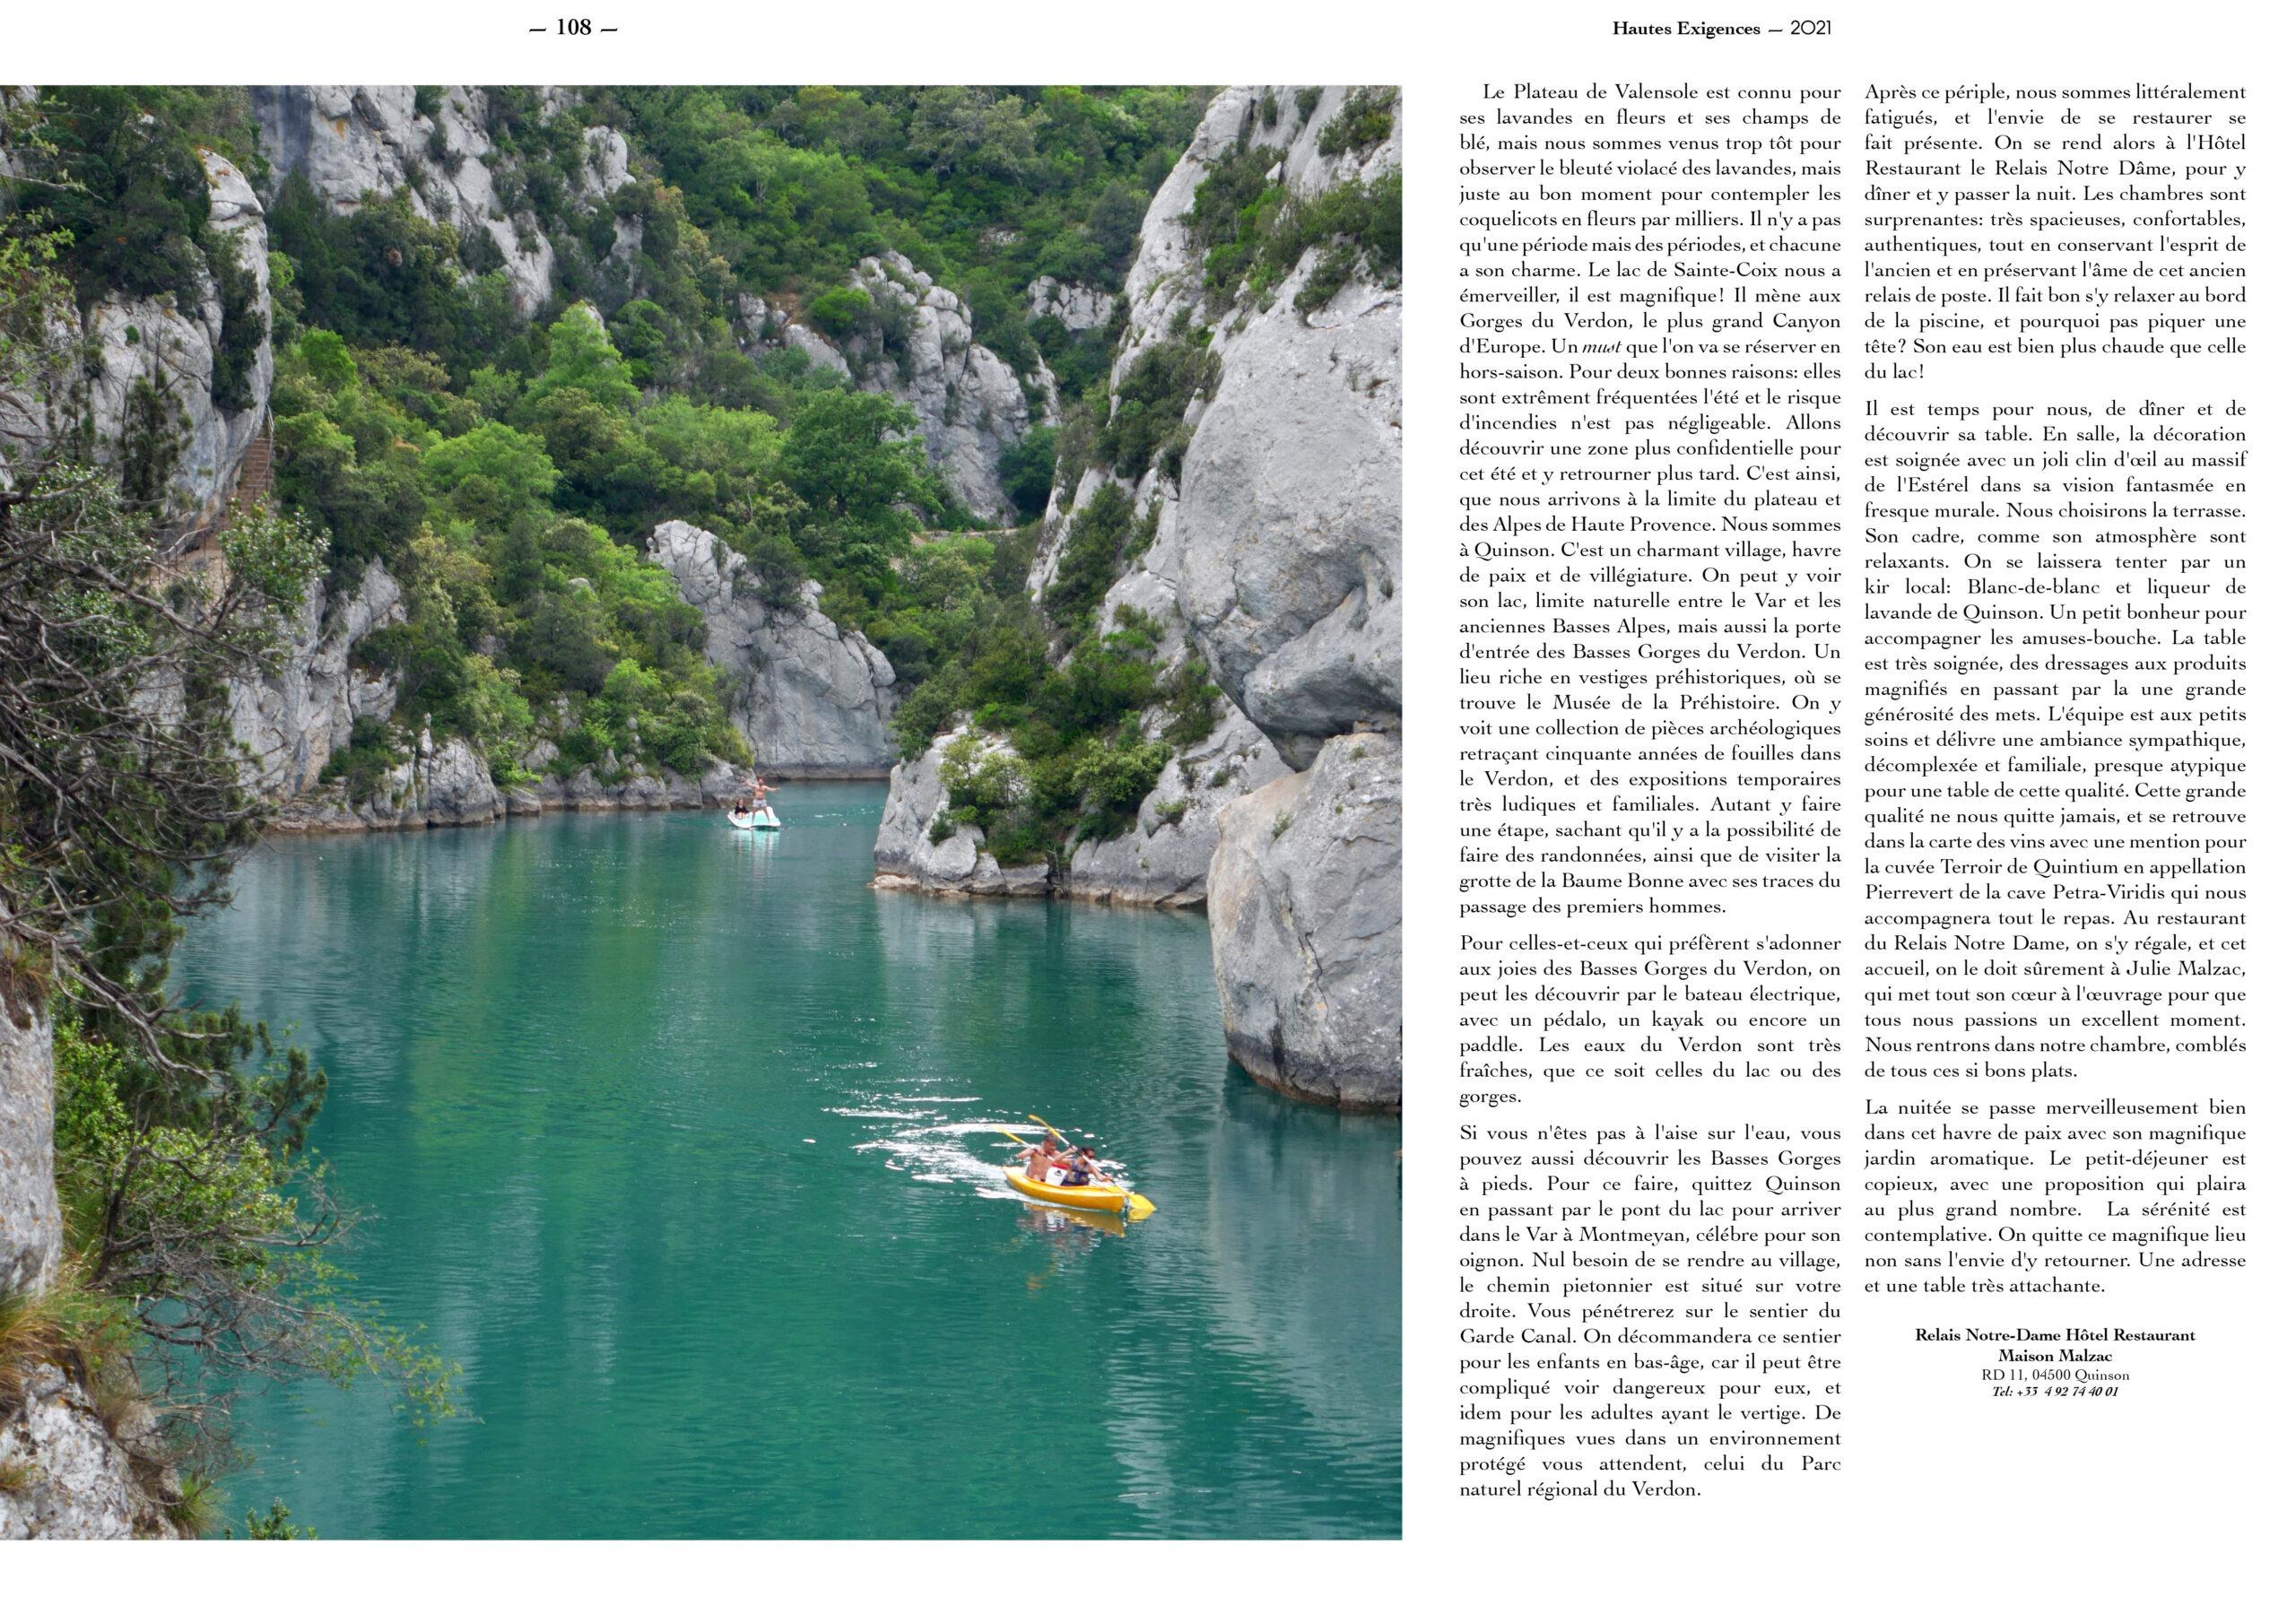 Hautes Exigences Magazine Hors Serie 2021 page 106-107